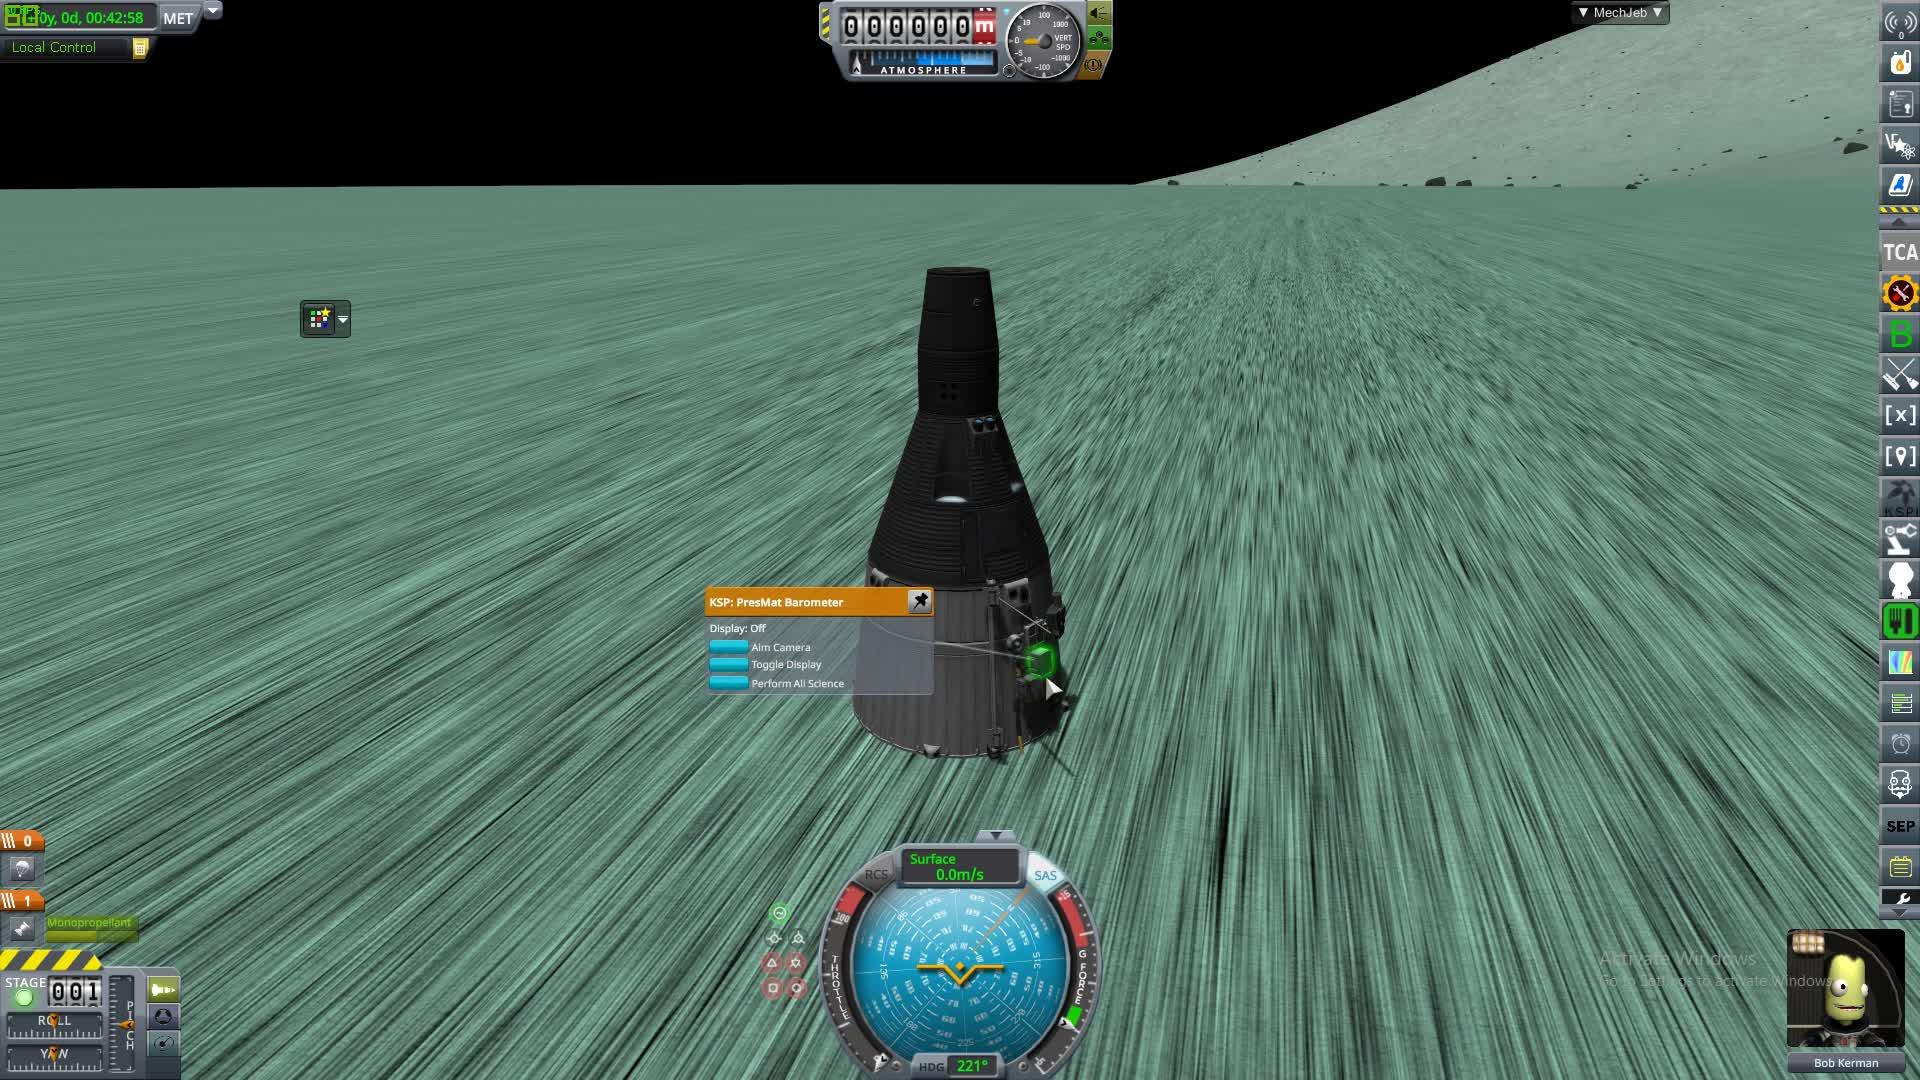 Kerbal Space Program 02.25.2018 - 12.53.37.02 GIFs